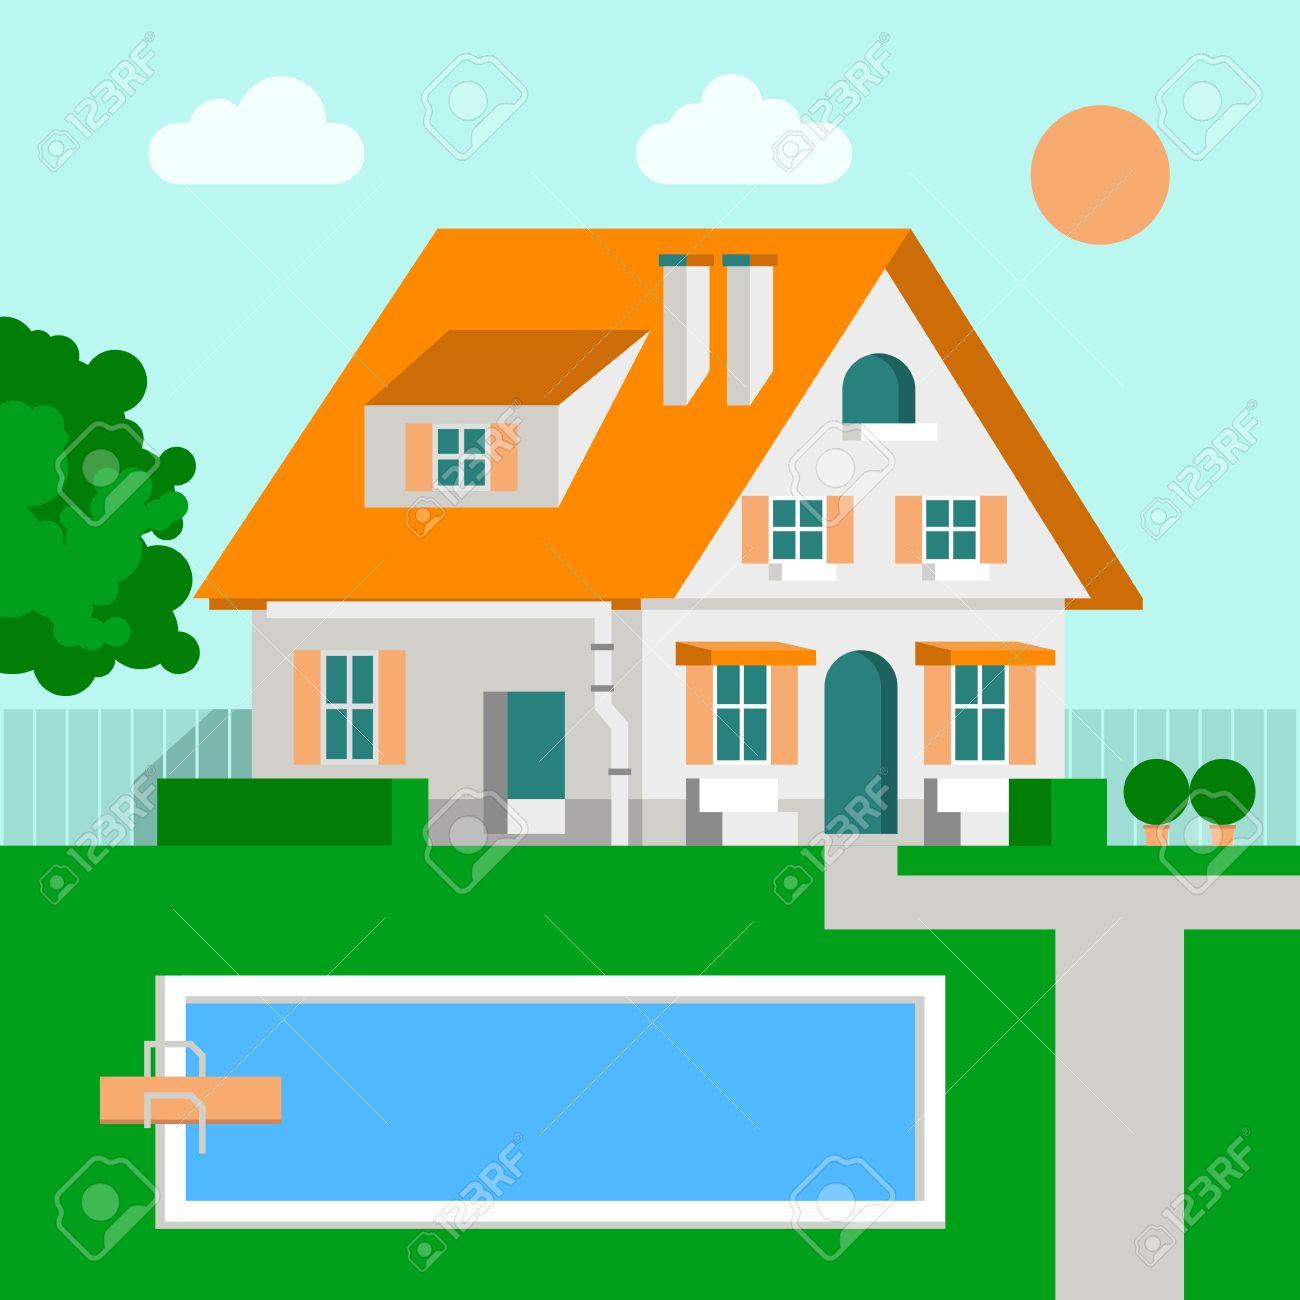 House design cartoon - Vector Illustration Family House Cartoon Flat Design Stock Vector 53371503